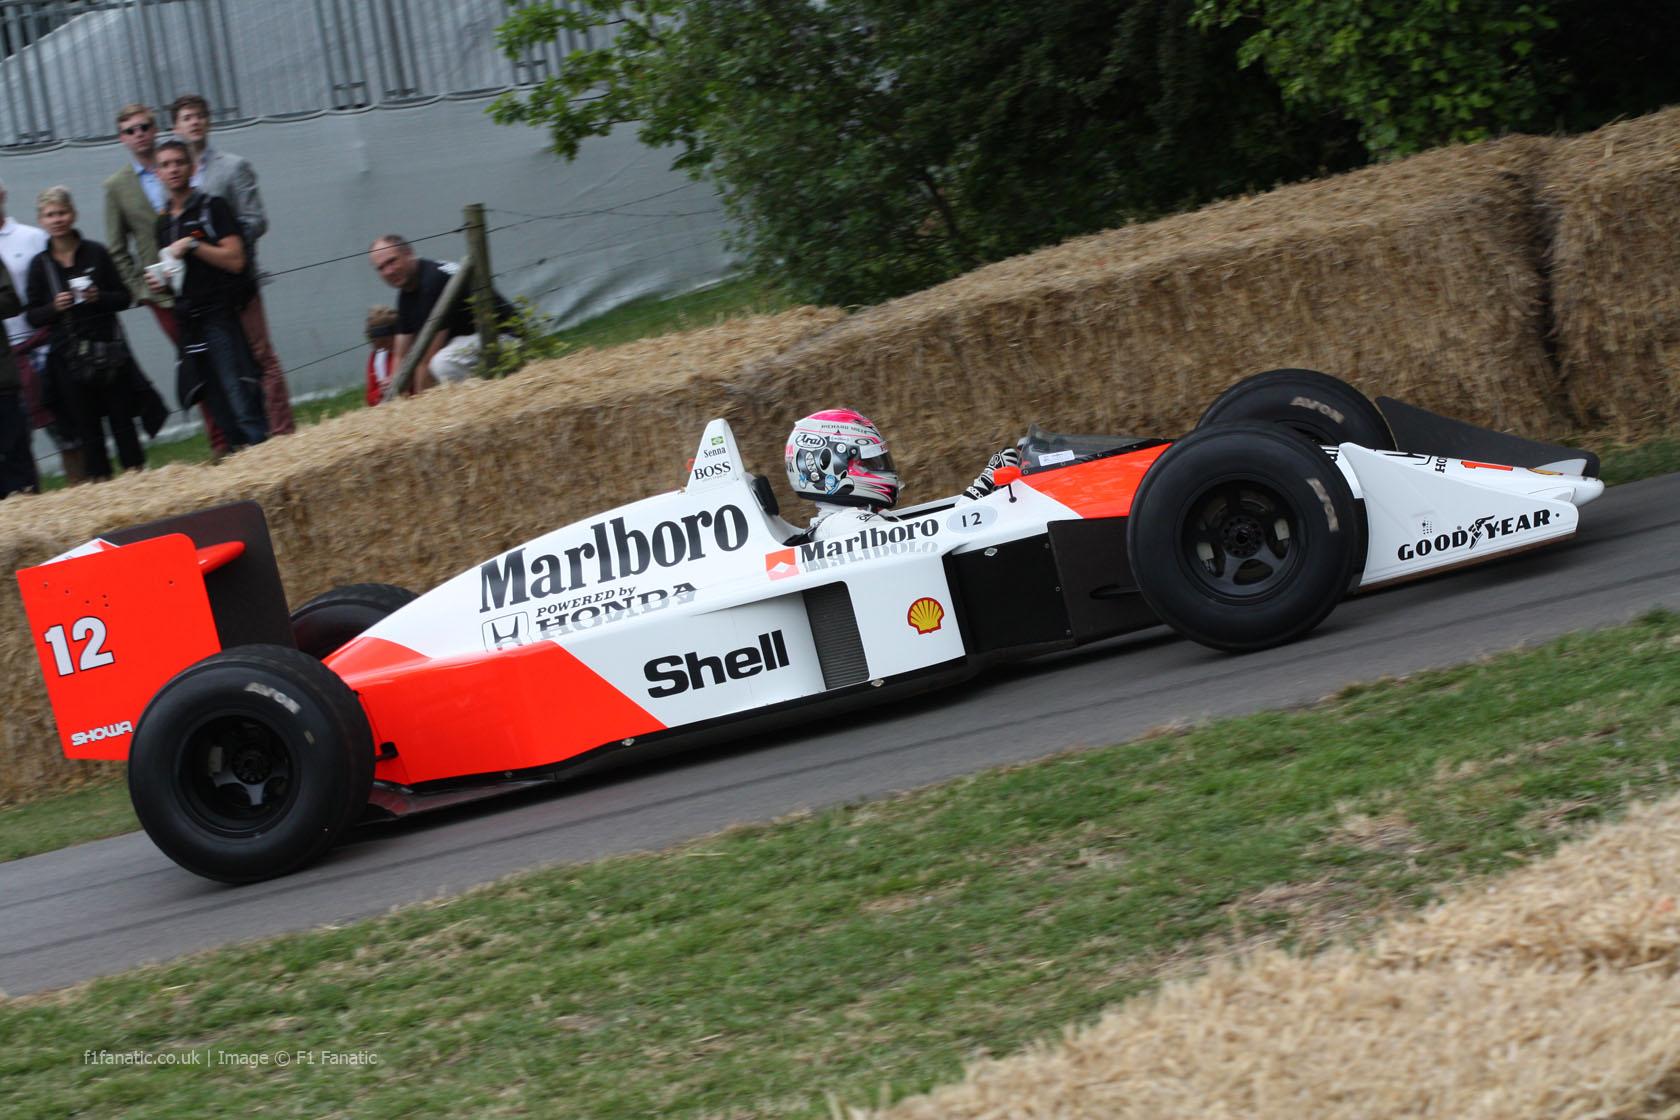 McLaren MP4-4 (3), Goodwood Festival of Speed, 2014